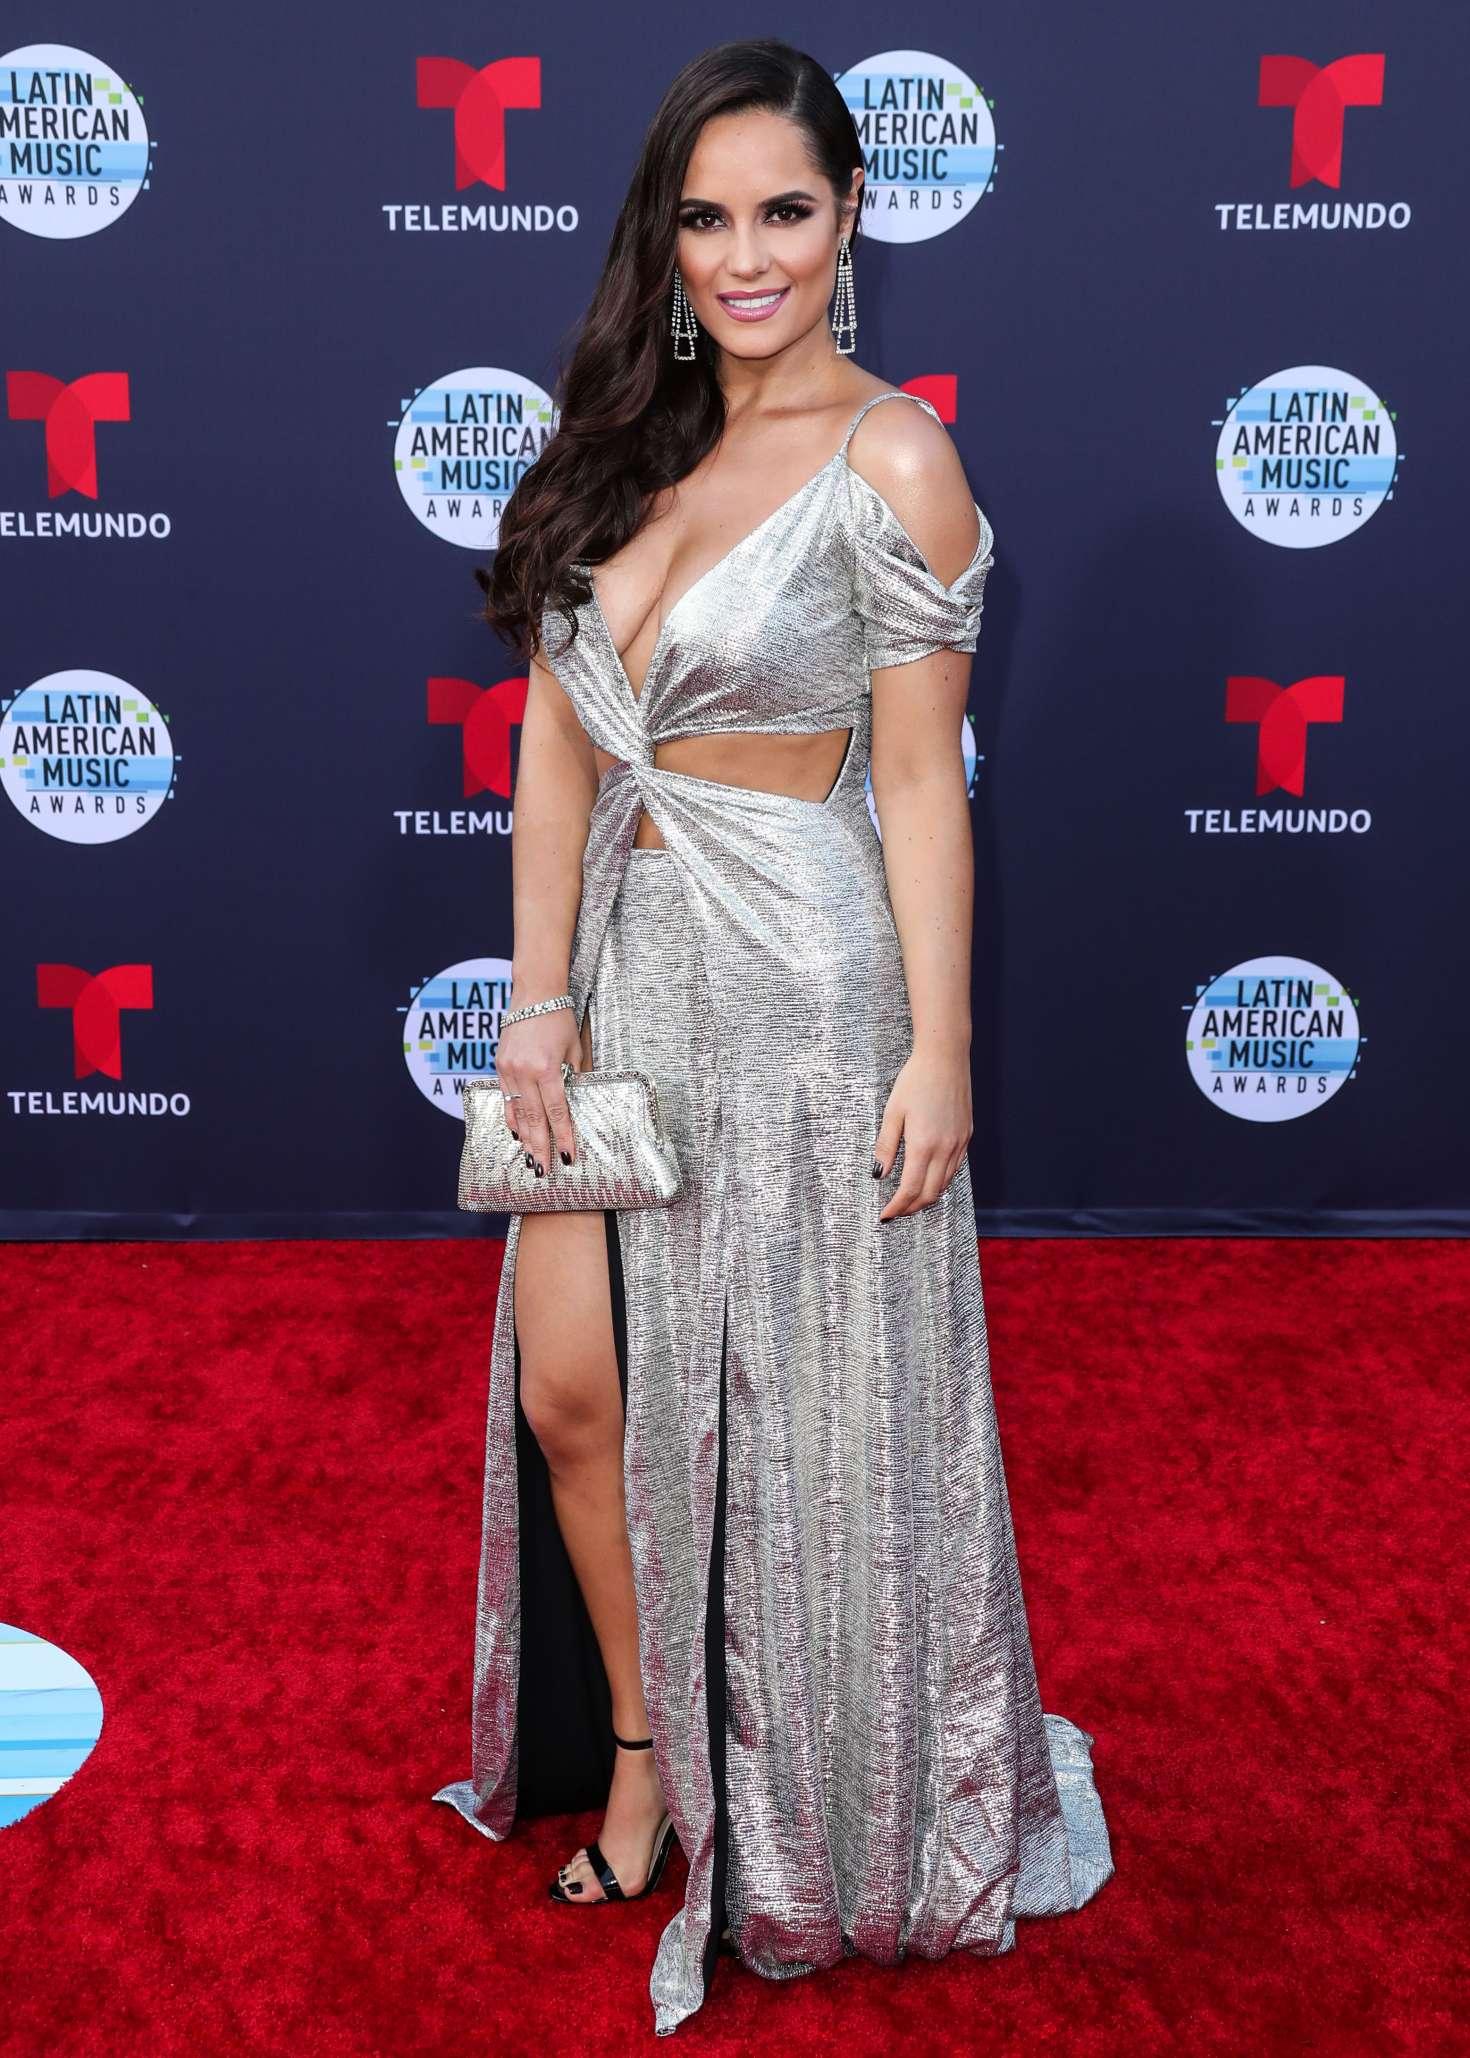 Ana Lucia Dominguez 2018 : Ana Lucia Dominguez: 2018 Latin American Music Awards -06